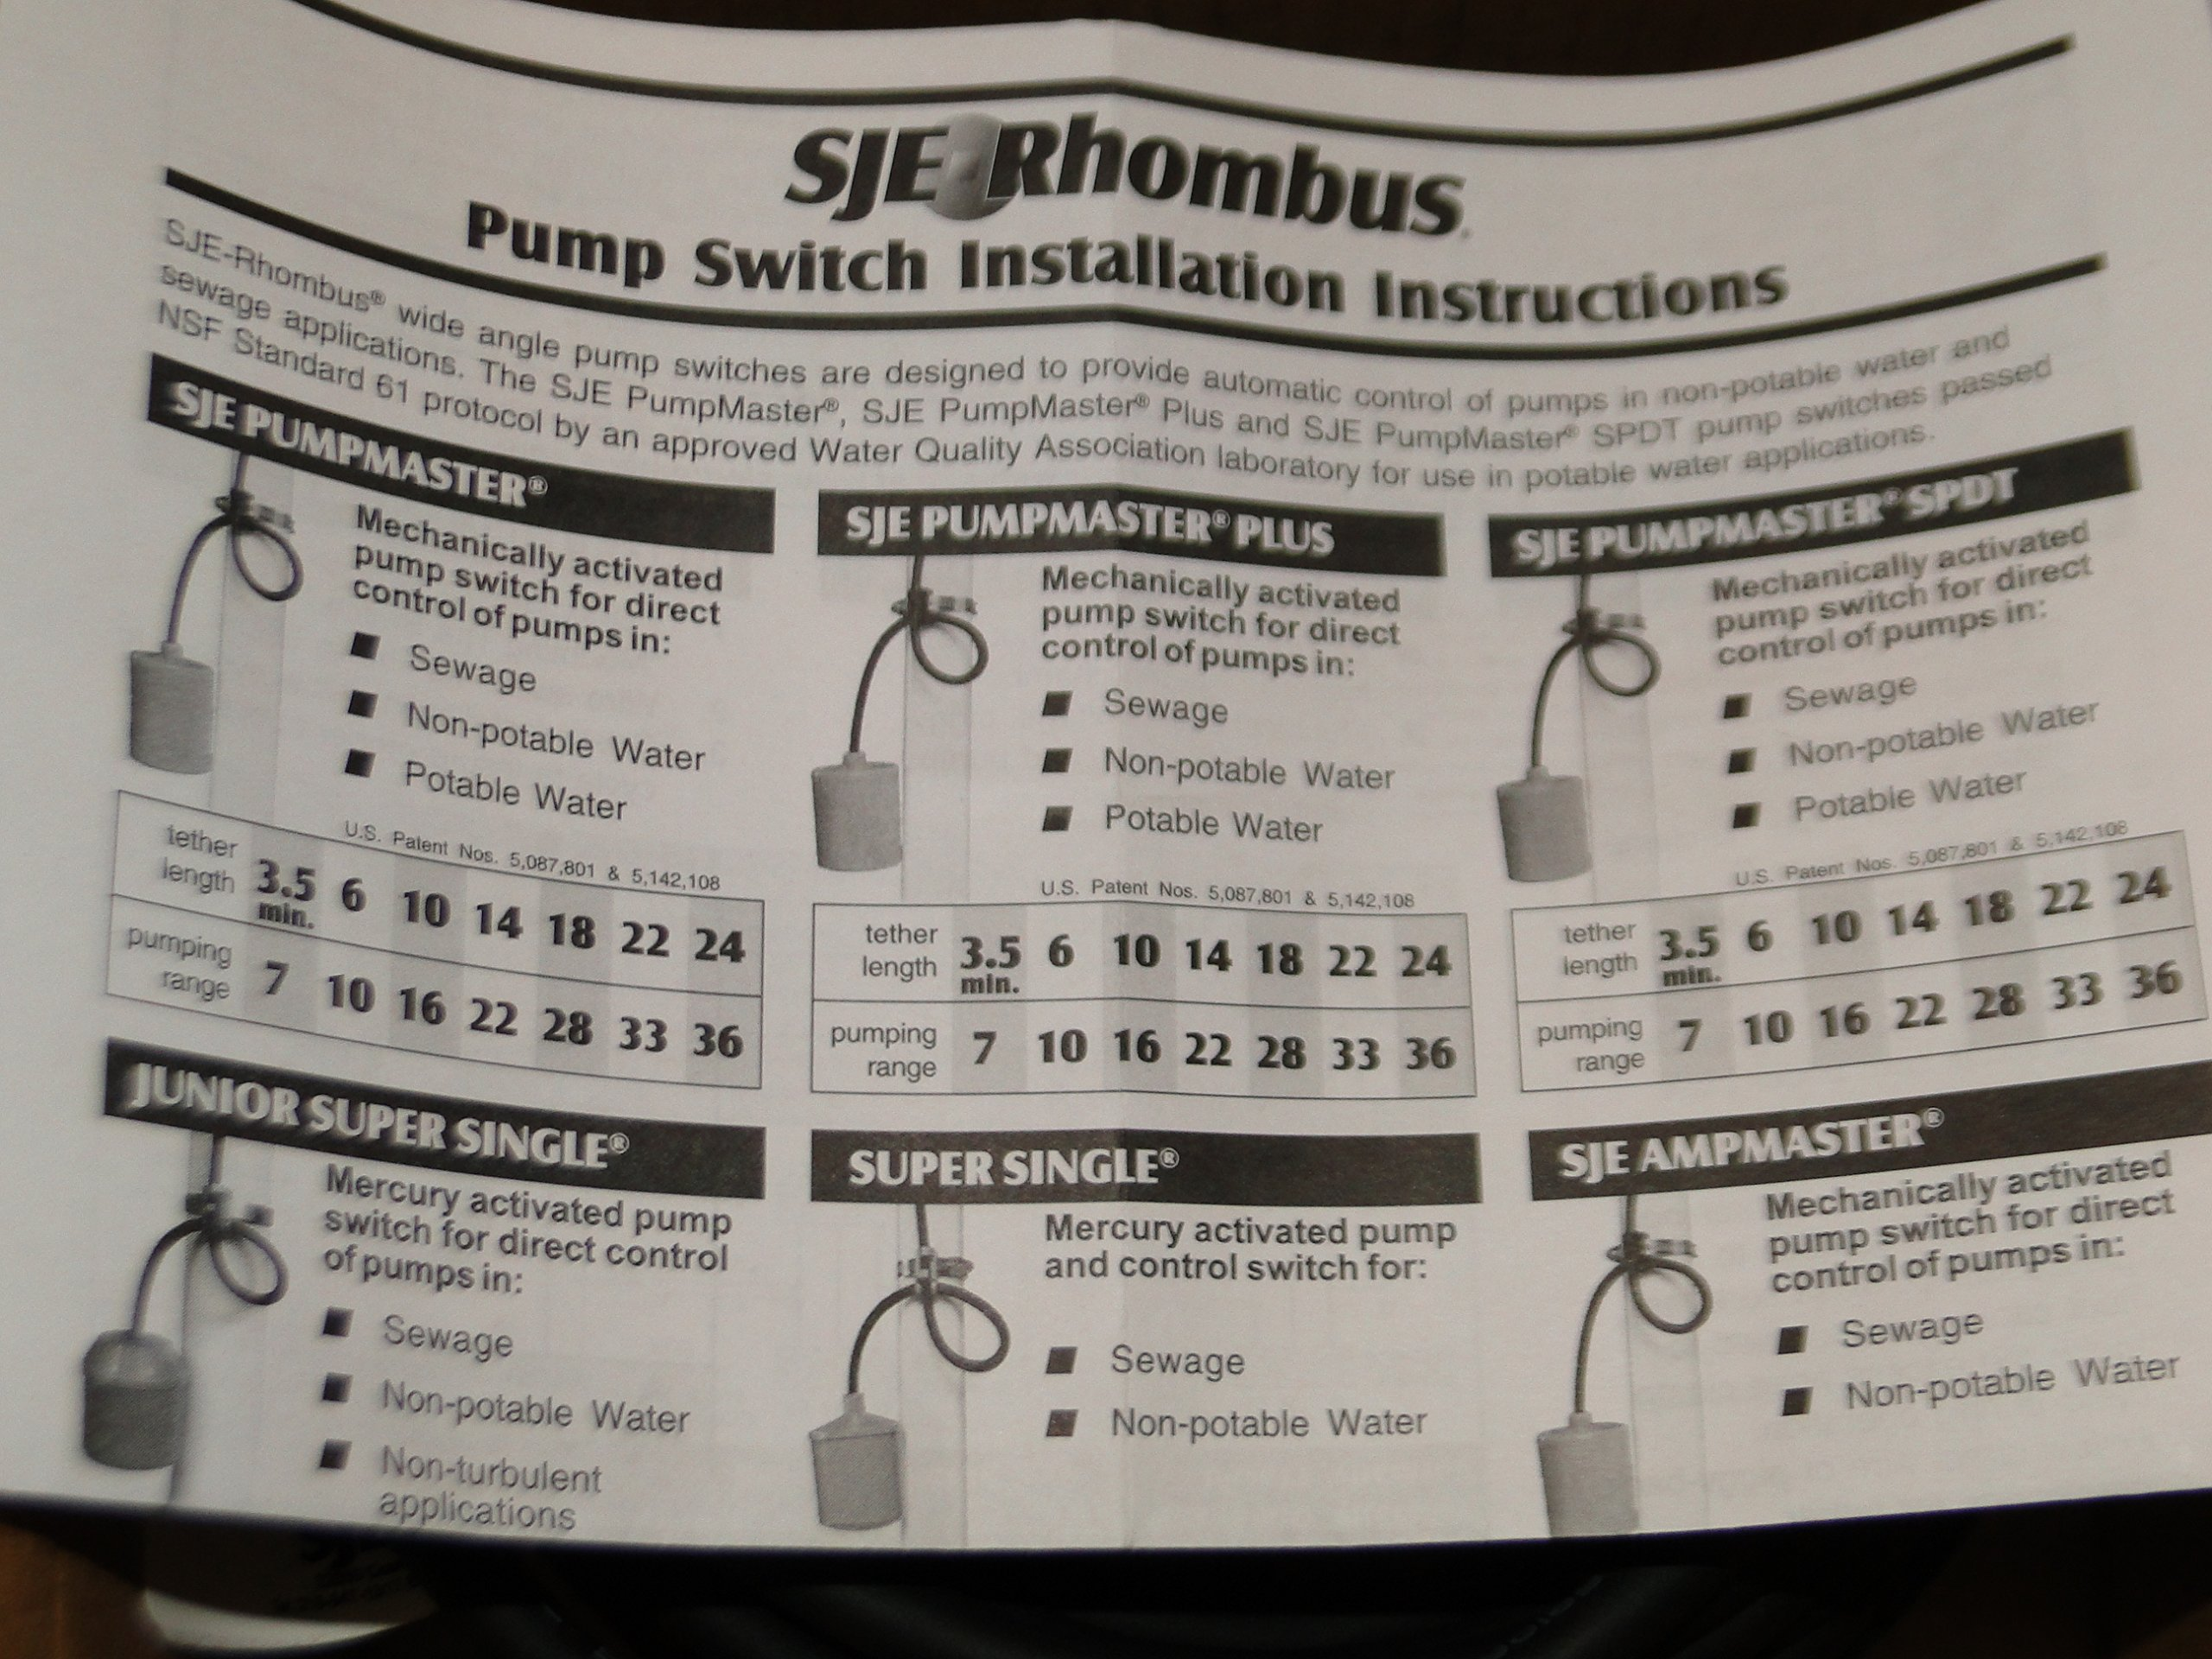 Float Switch PUMPMASTER Pump Switch SJE-RHOMBUS Pump Down 20PMD1WP 20FT 120 V w/PLUG